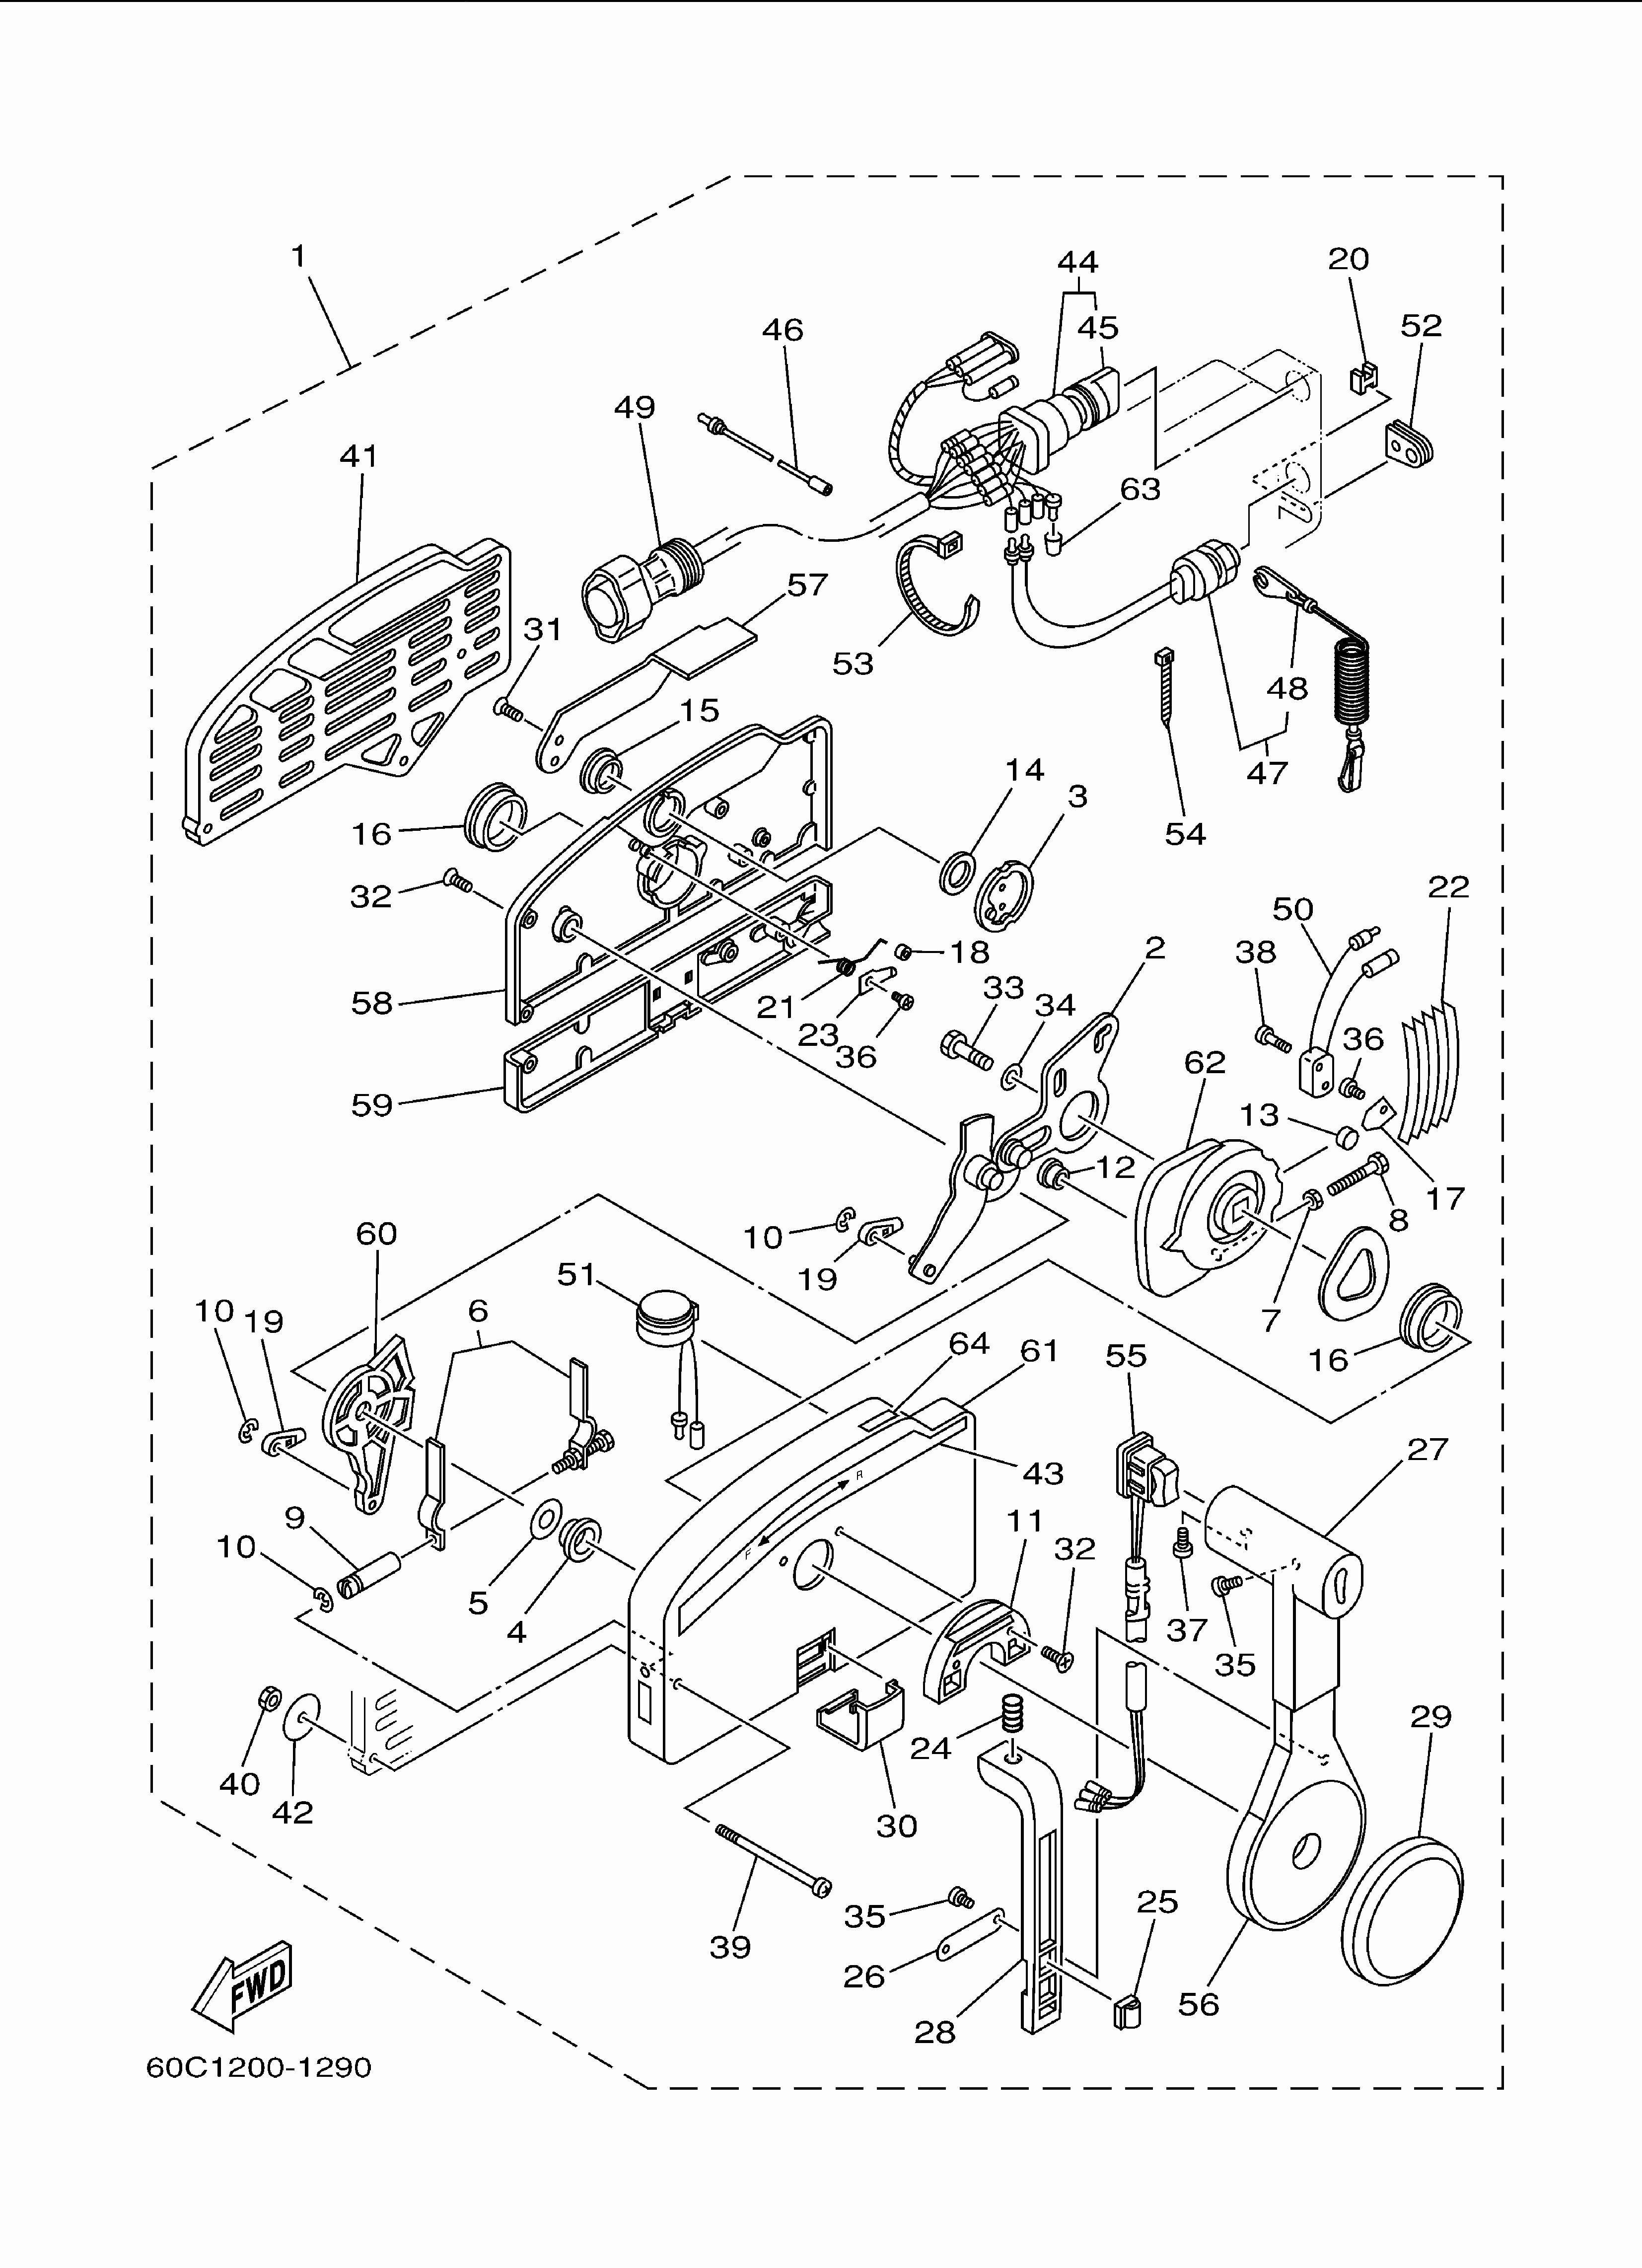 Mercury Throttle Control Box Diagram Unique Yamaha 703 Control Converting Pull to Push